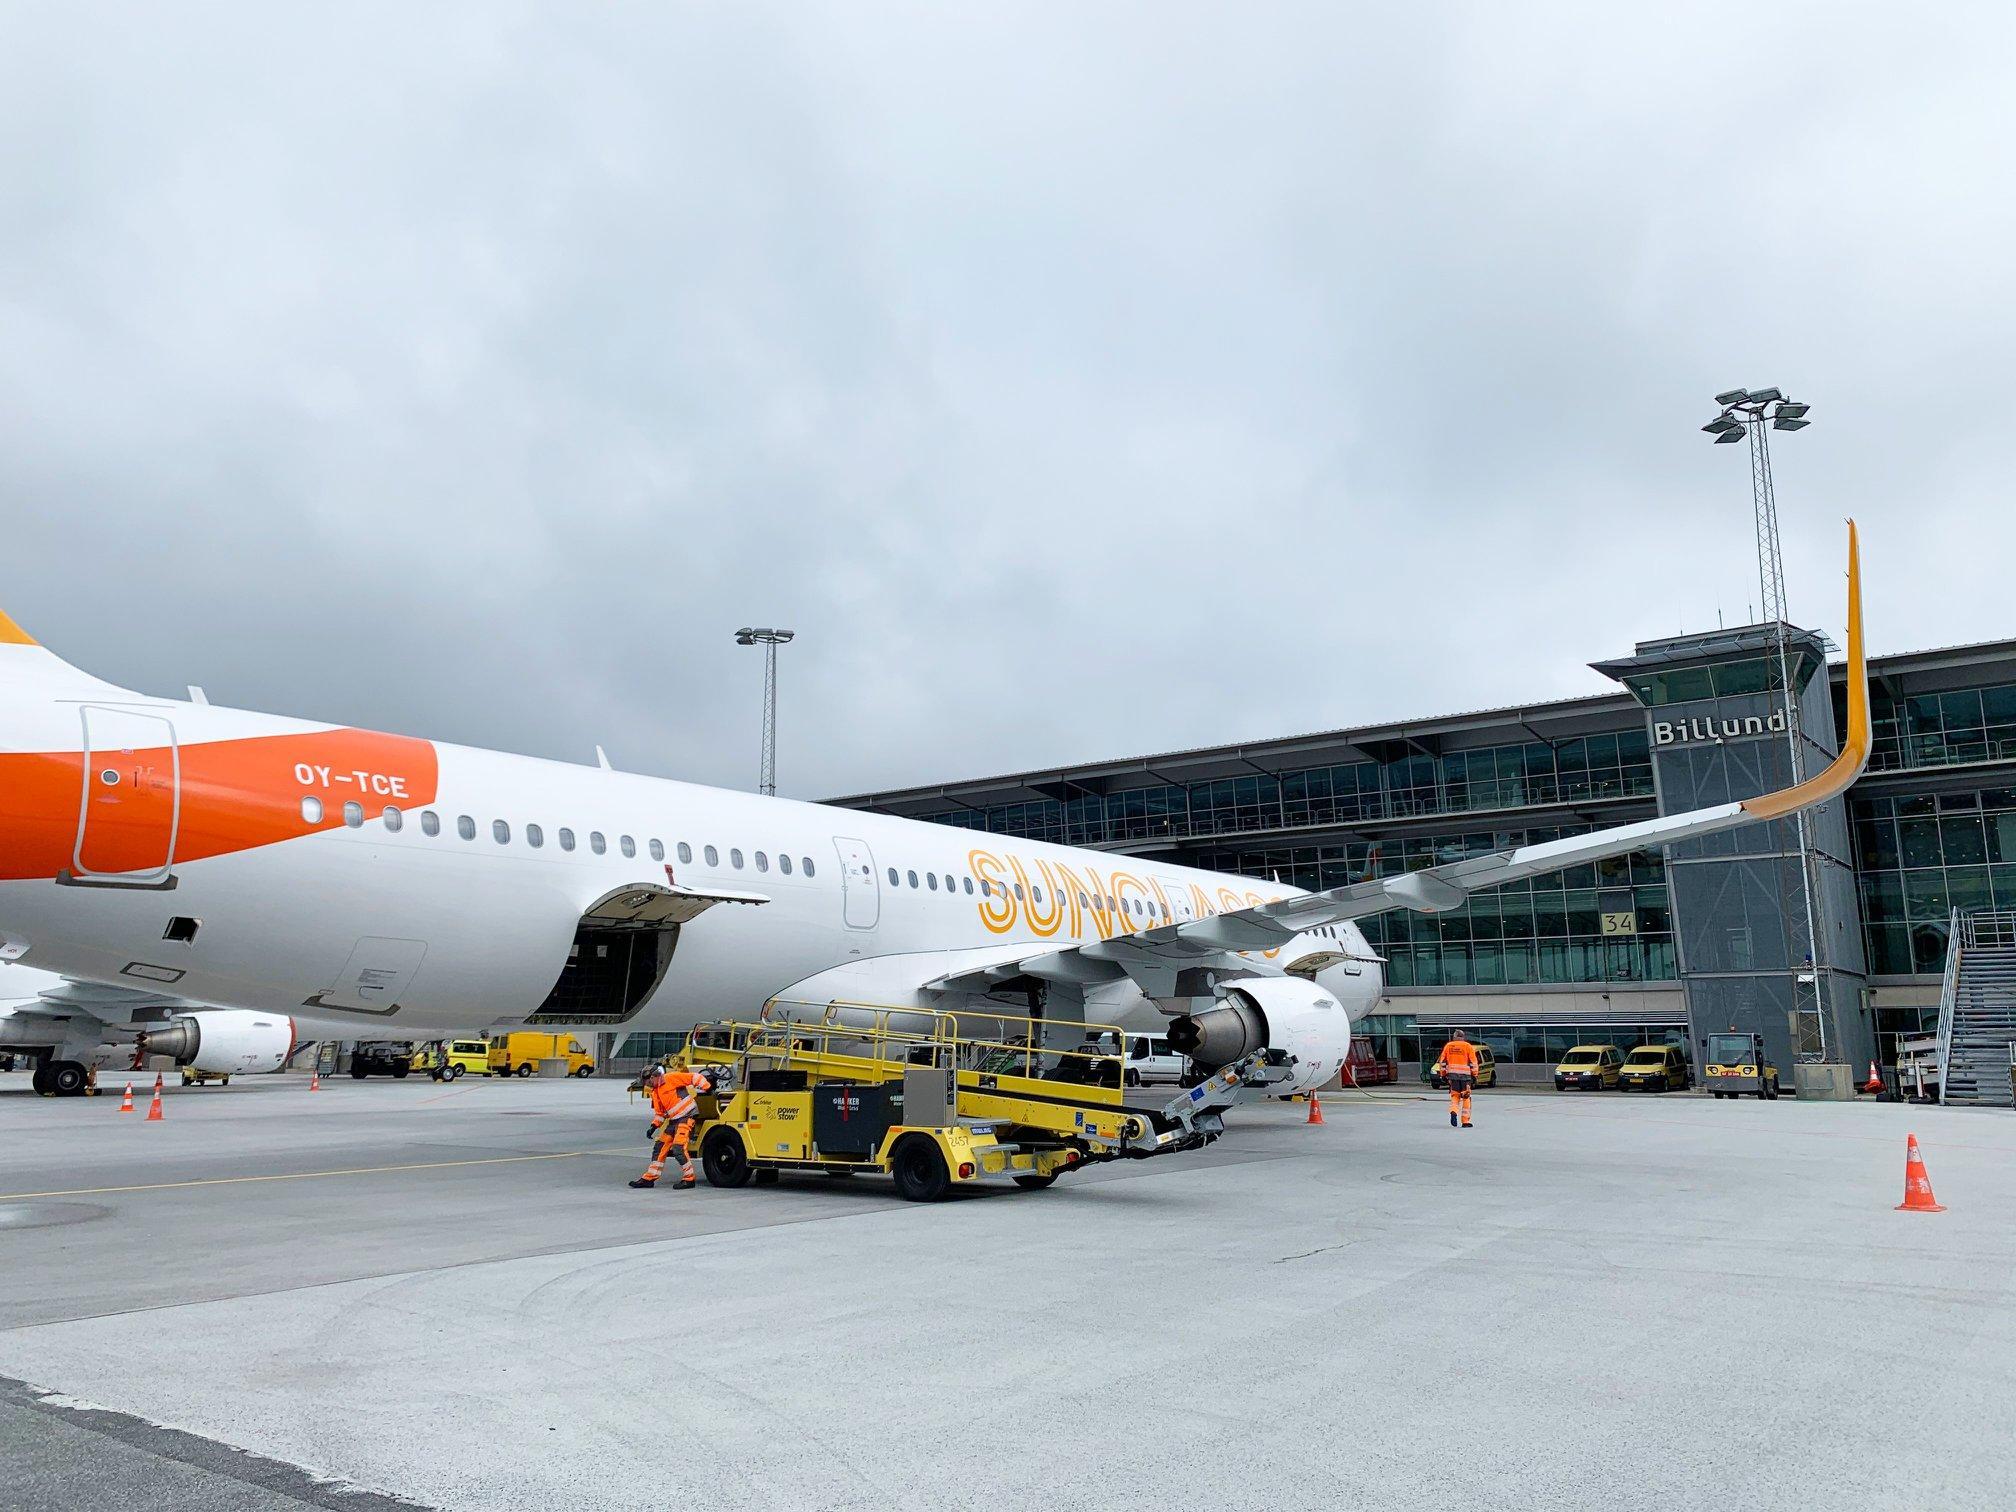 Airbus A321-fly fra Sunclass Airlines i Billund Lufthavn. (Foto: Billund Lufthavn | Facebook)